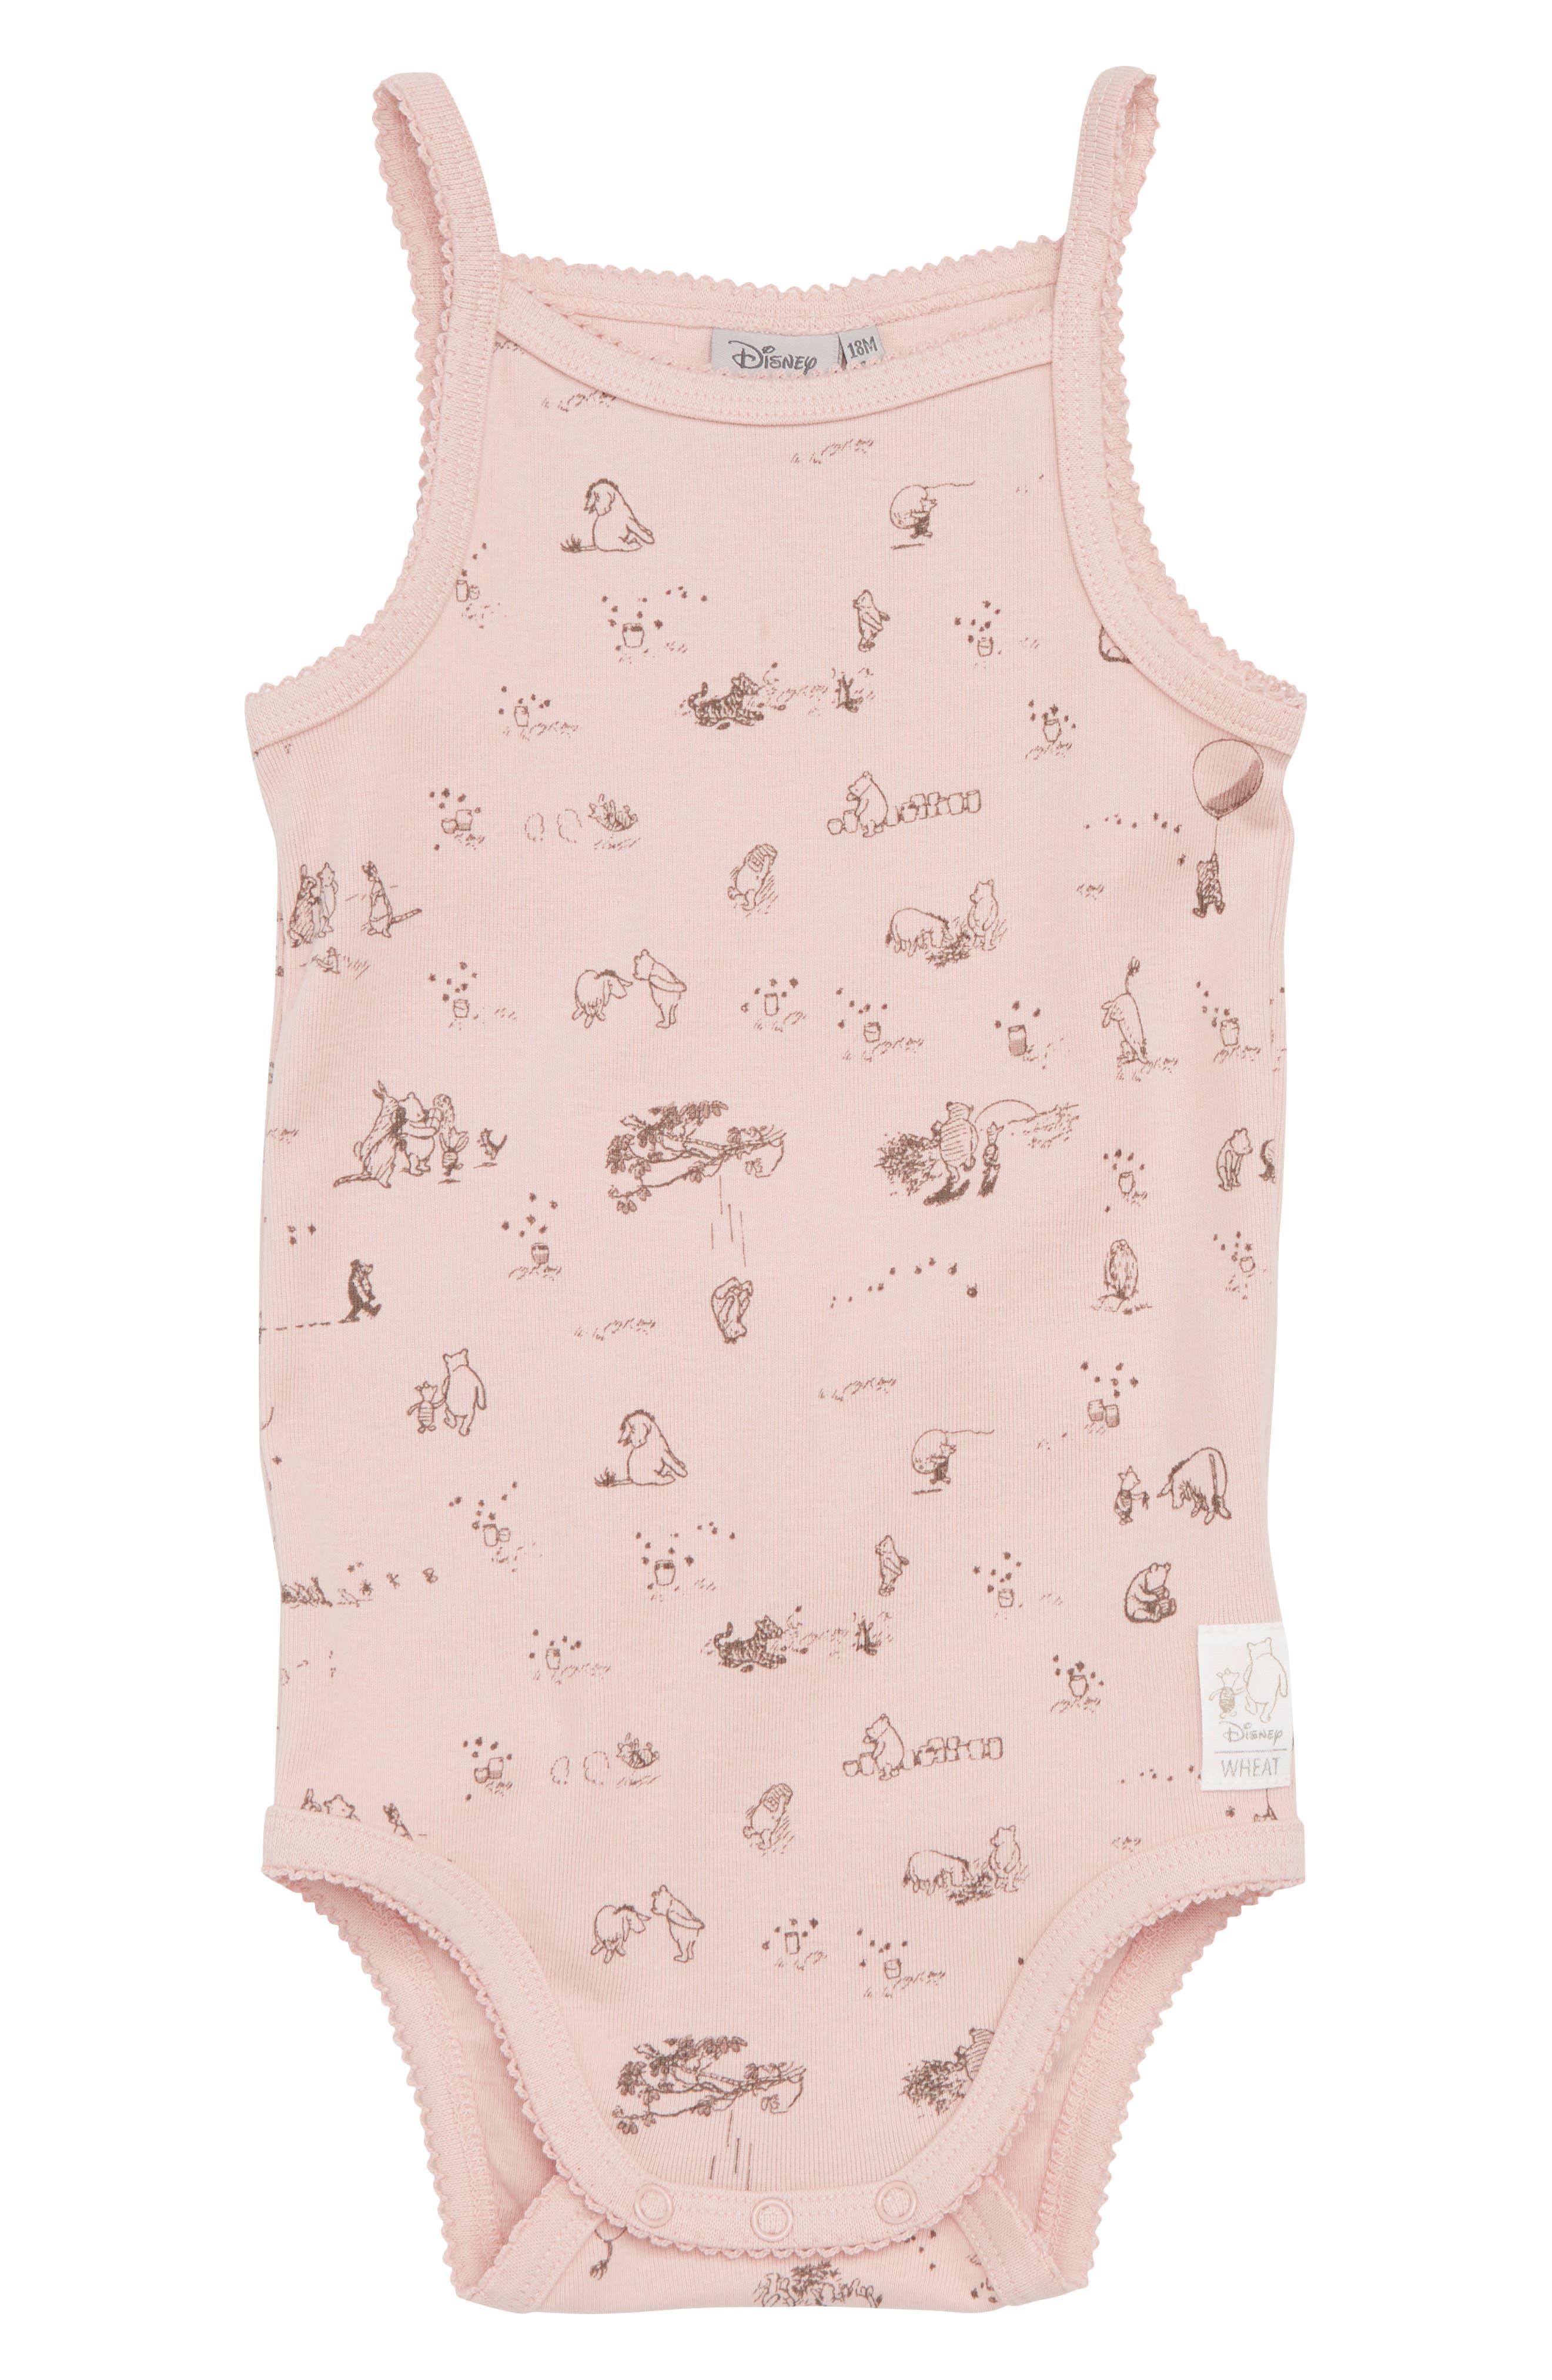 x Disney<sup>®</sup> Winnie the Pooh Organic Cotton Bodysuit,                         Main,                         color, 652